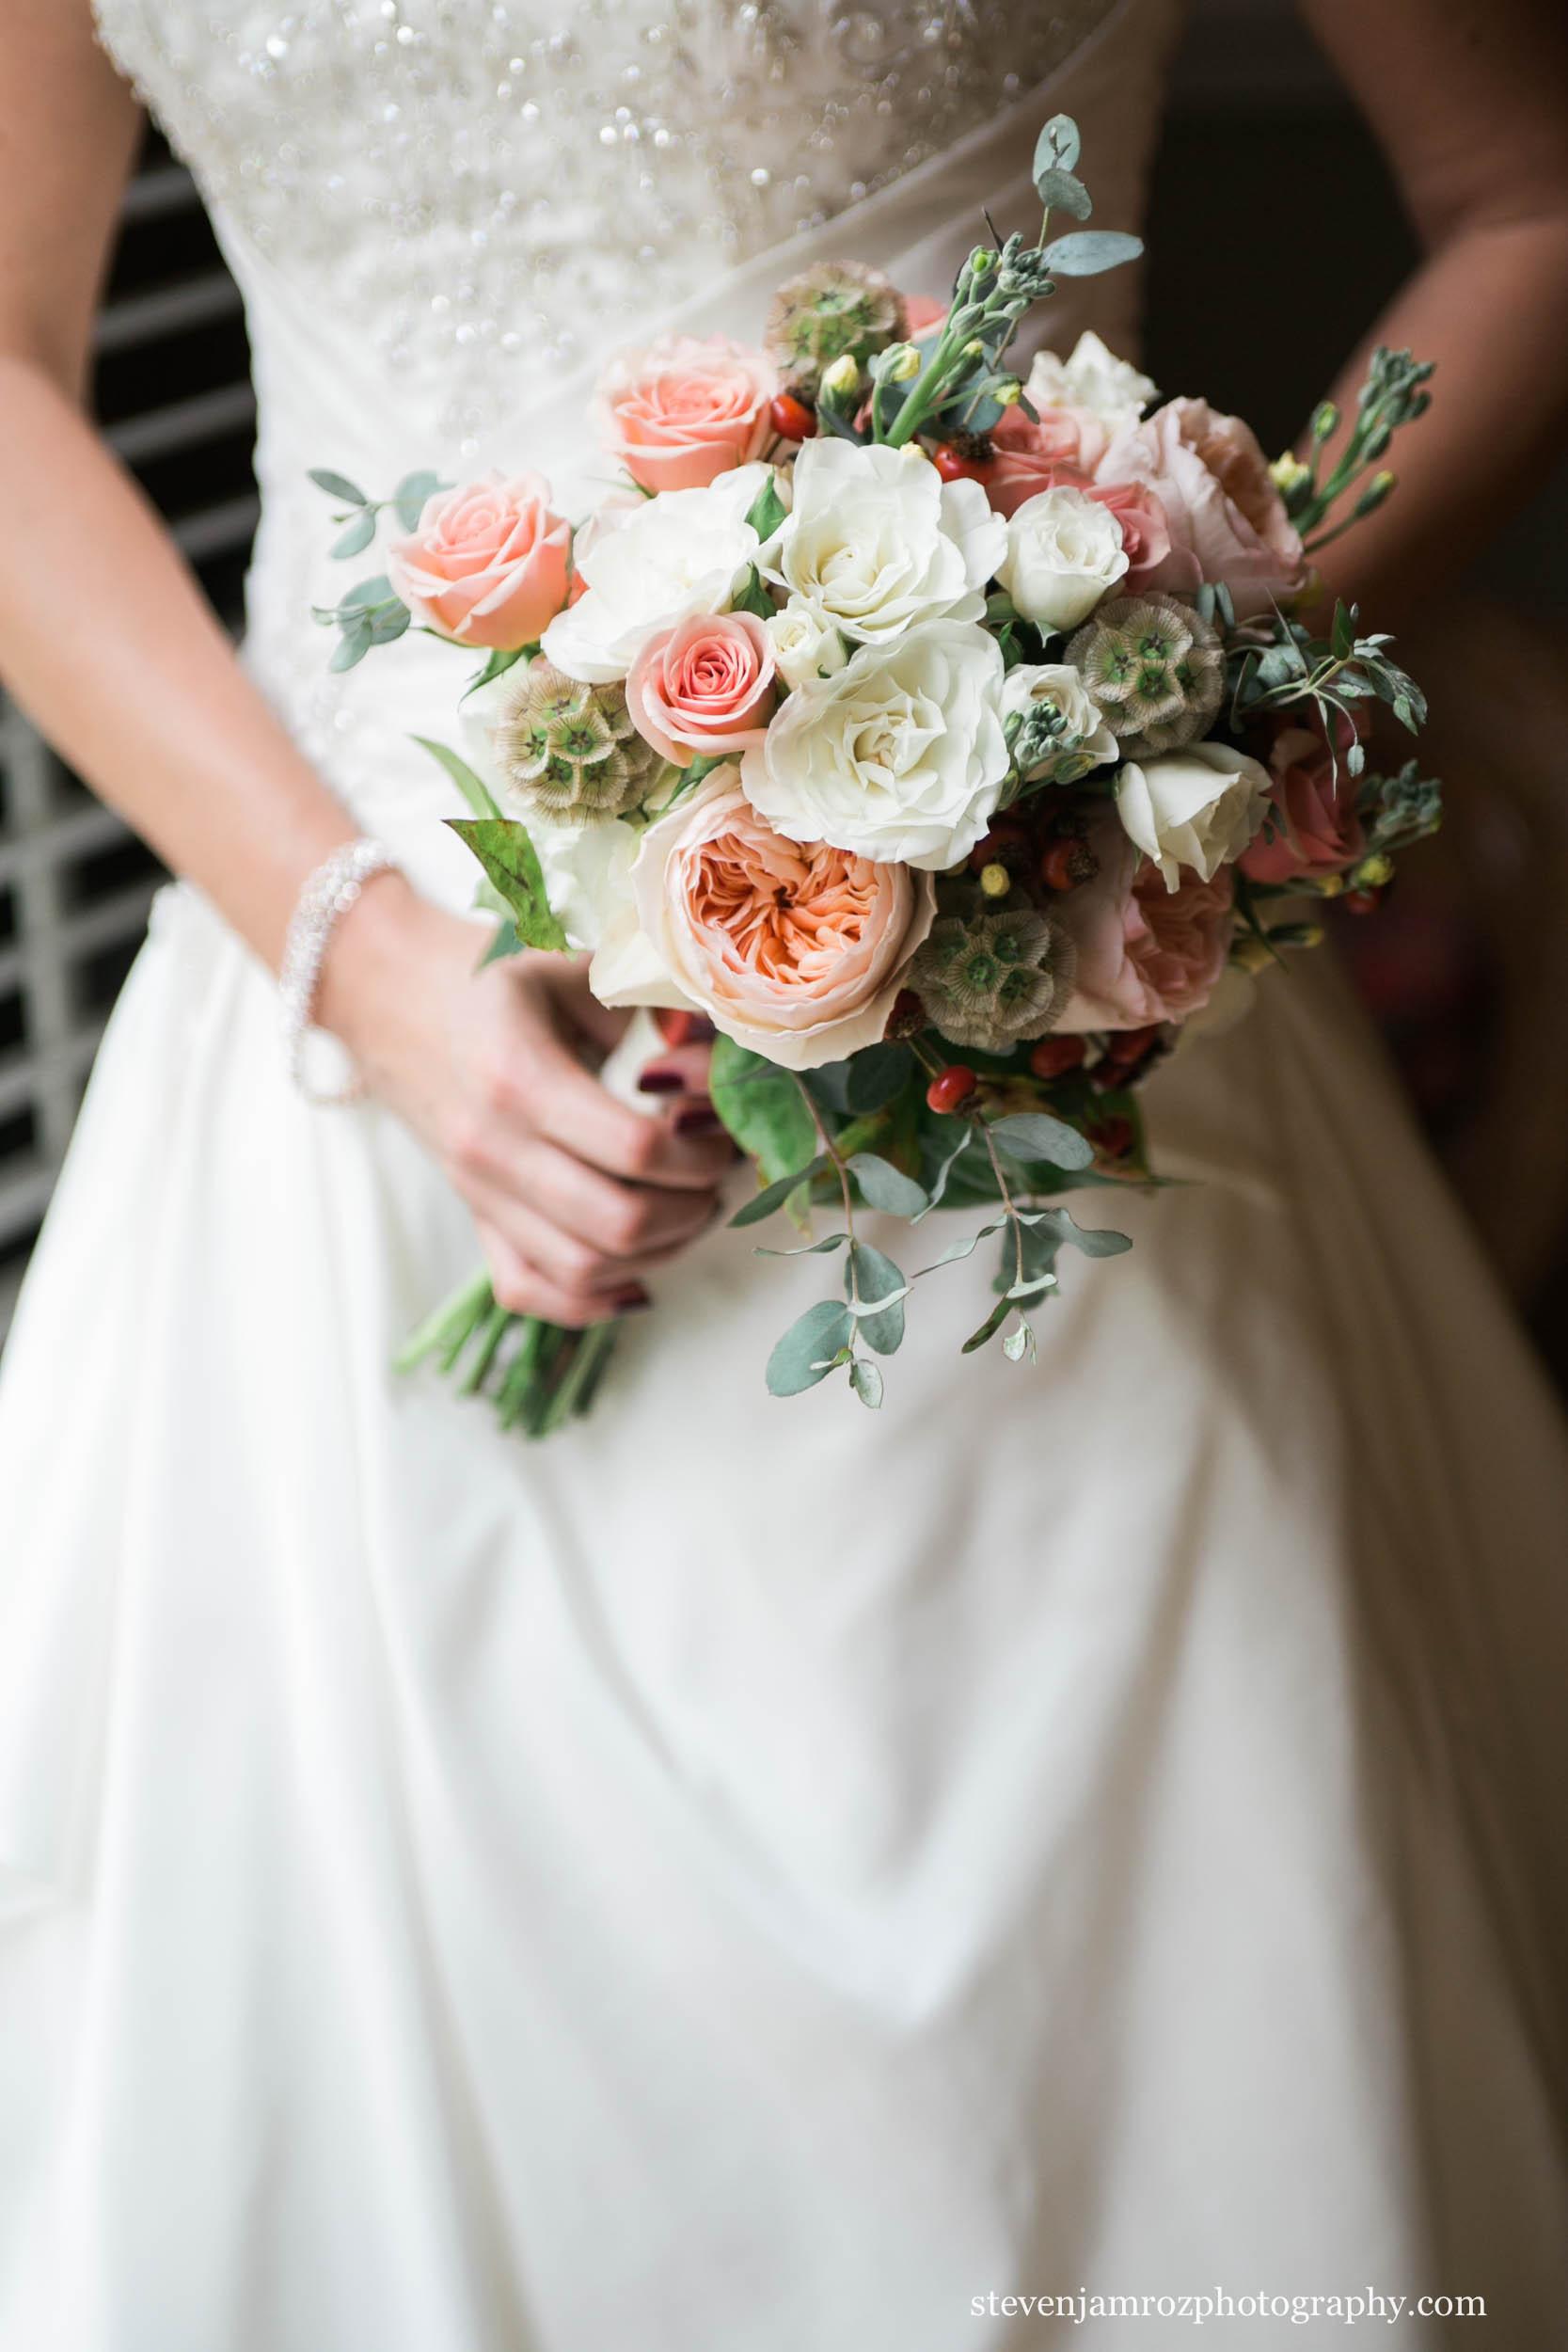 light-pink-white-flowers-raleigh-steven-jamroz-photography-0324.jpg